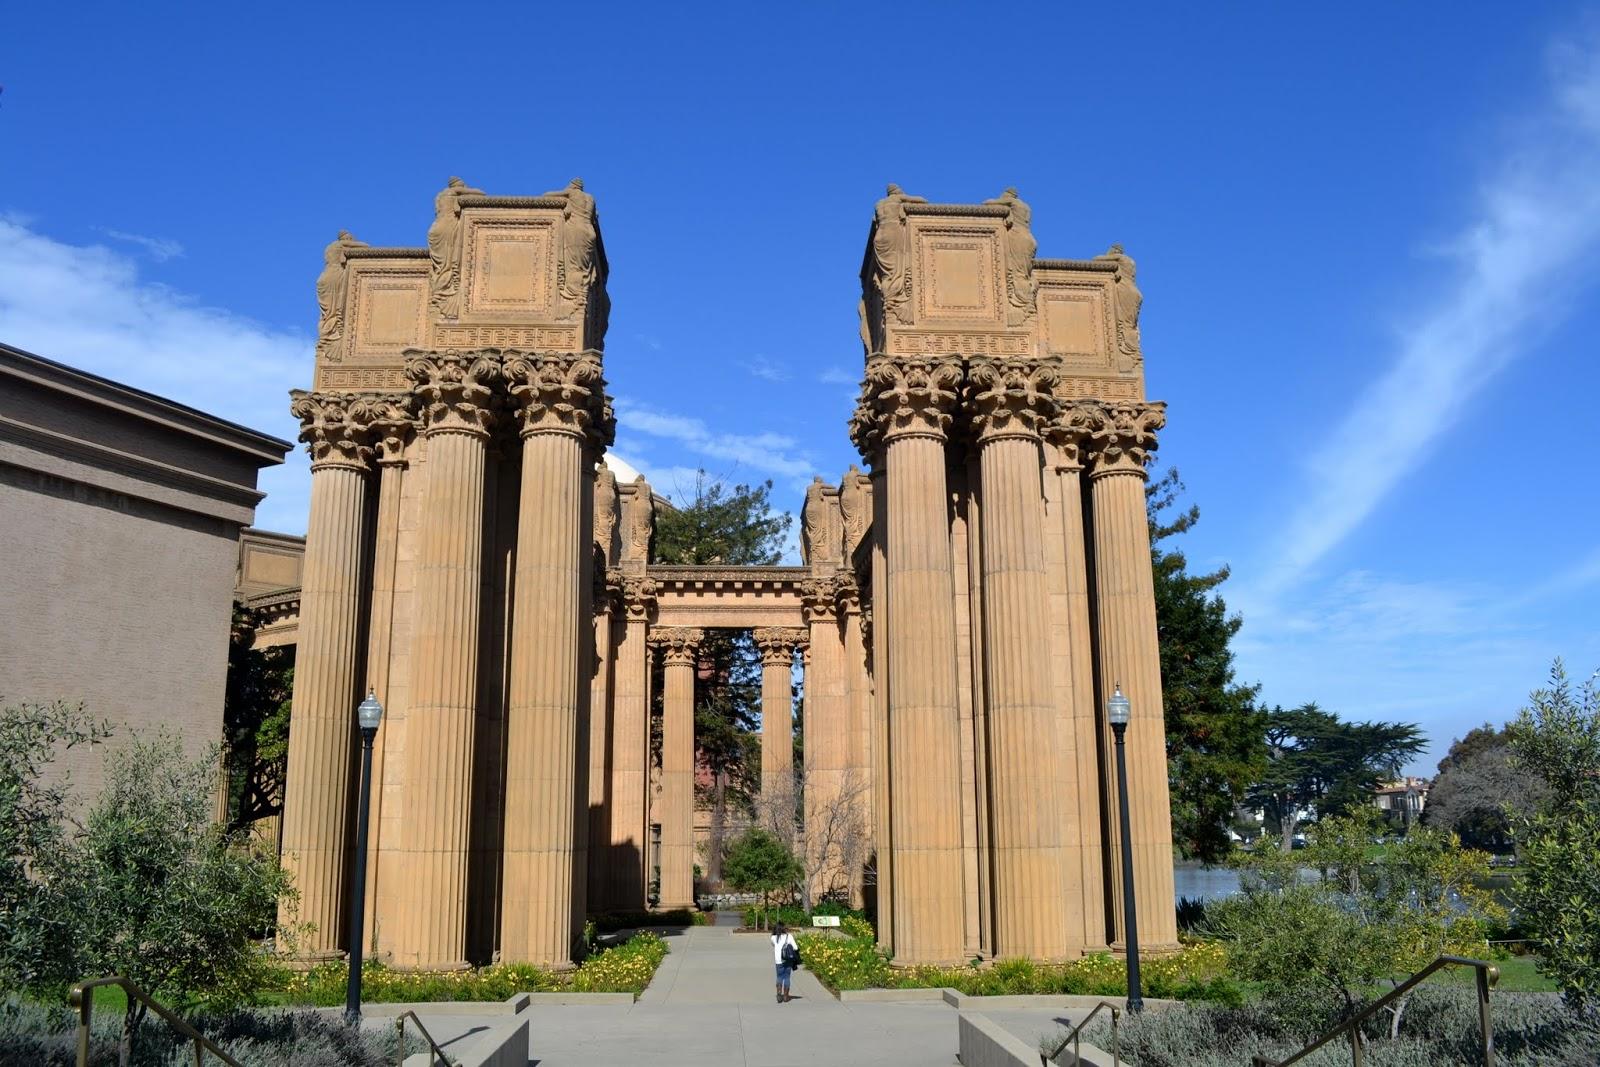 Дворец Искусства. Сан-Франциско, Калифорния. (Palace of Fine Arts, San Francisco, CA)